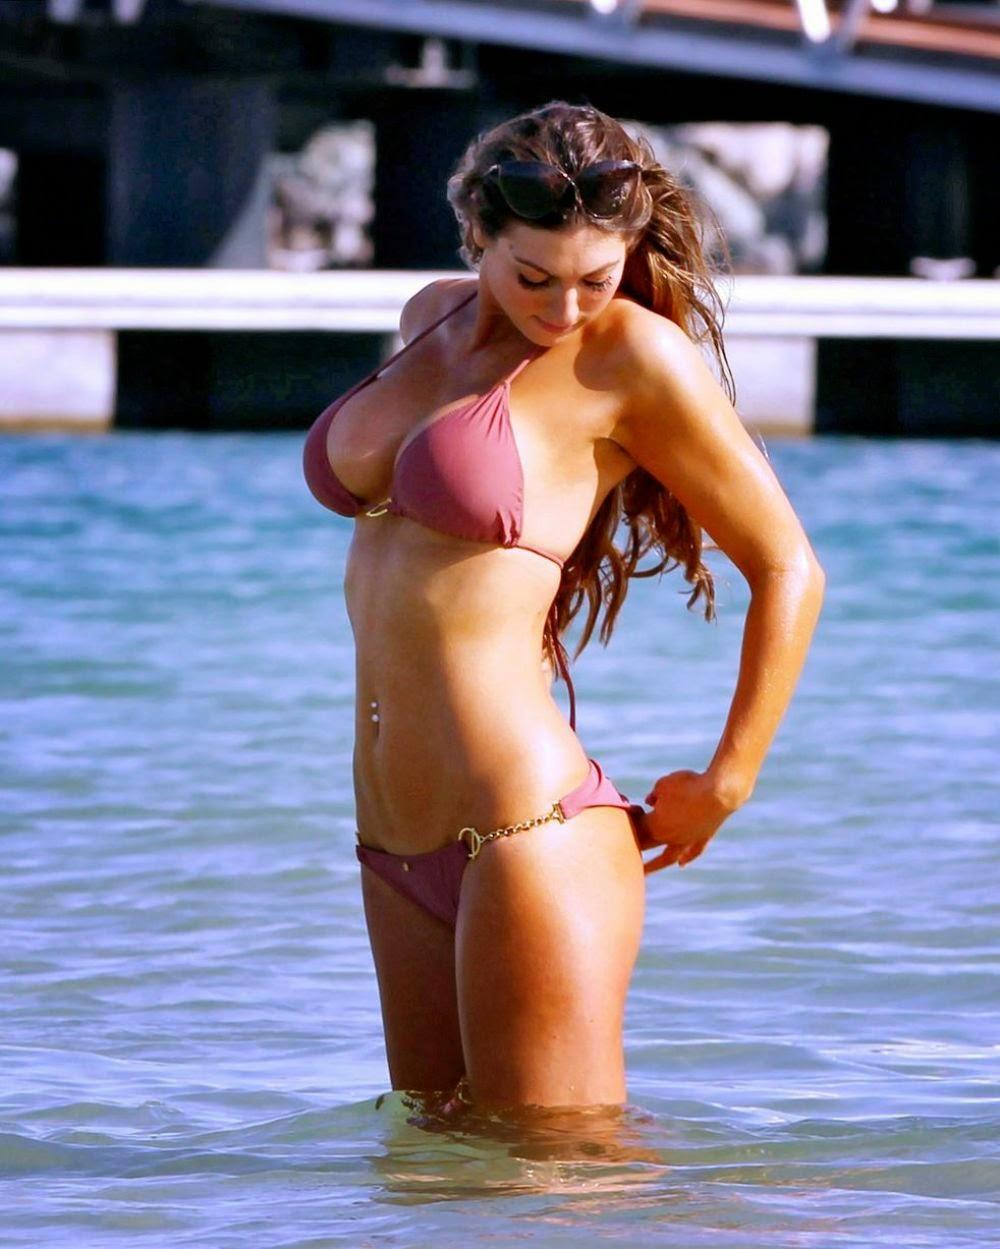 Naughty Bikini Pics 54